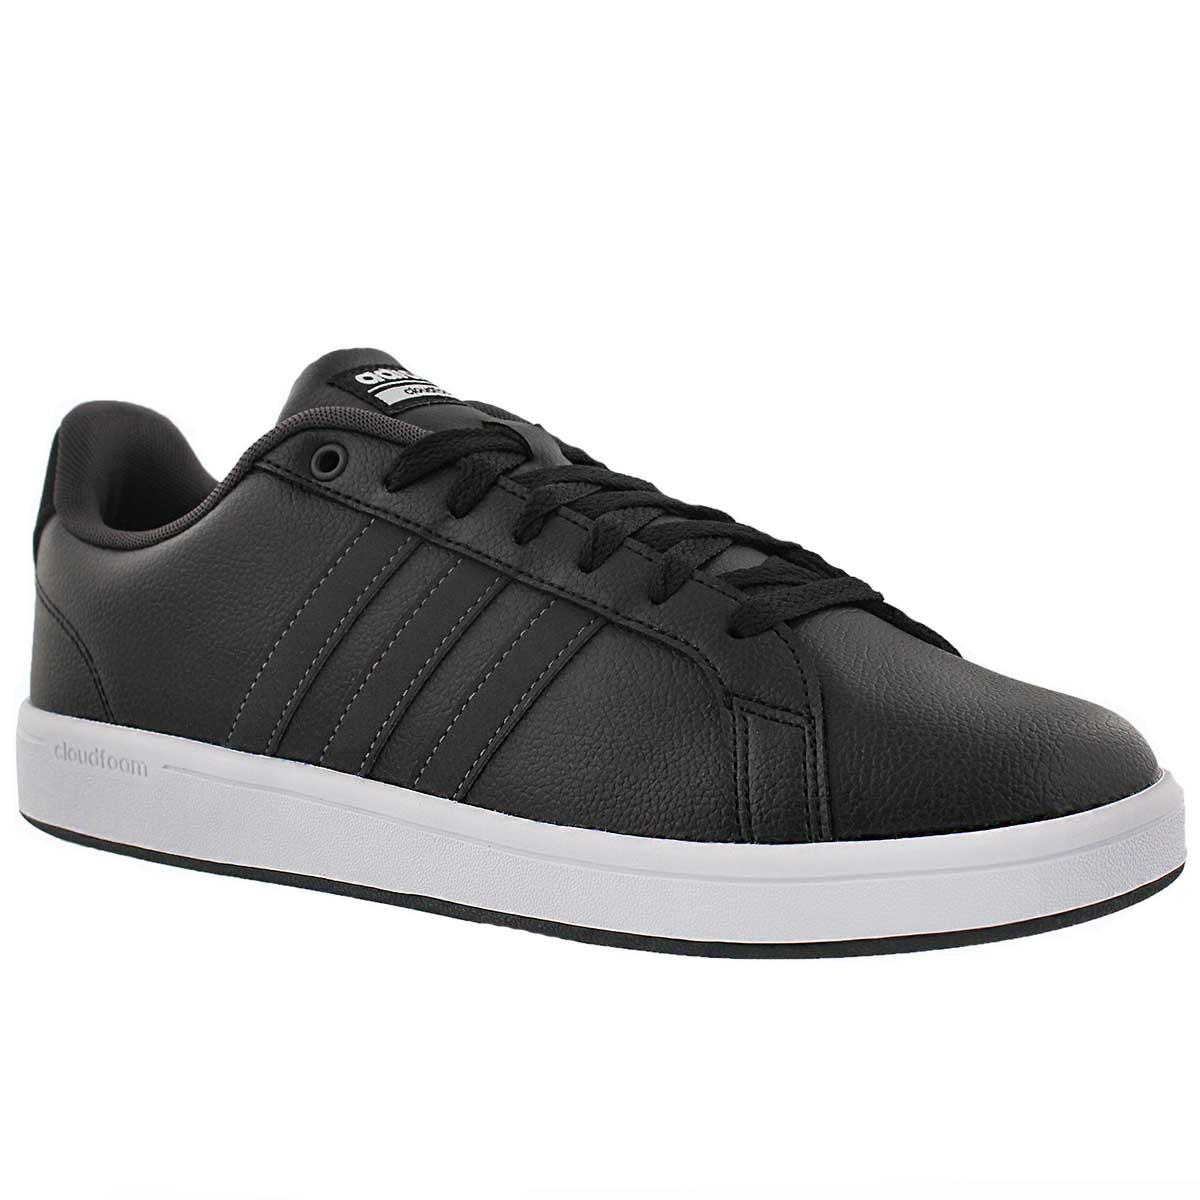 Men's CLOUDFOAM ADVANTAGE black sneakers